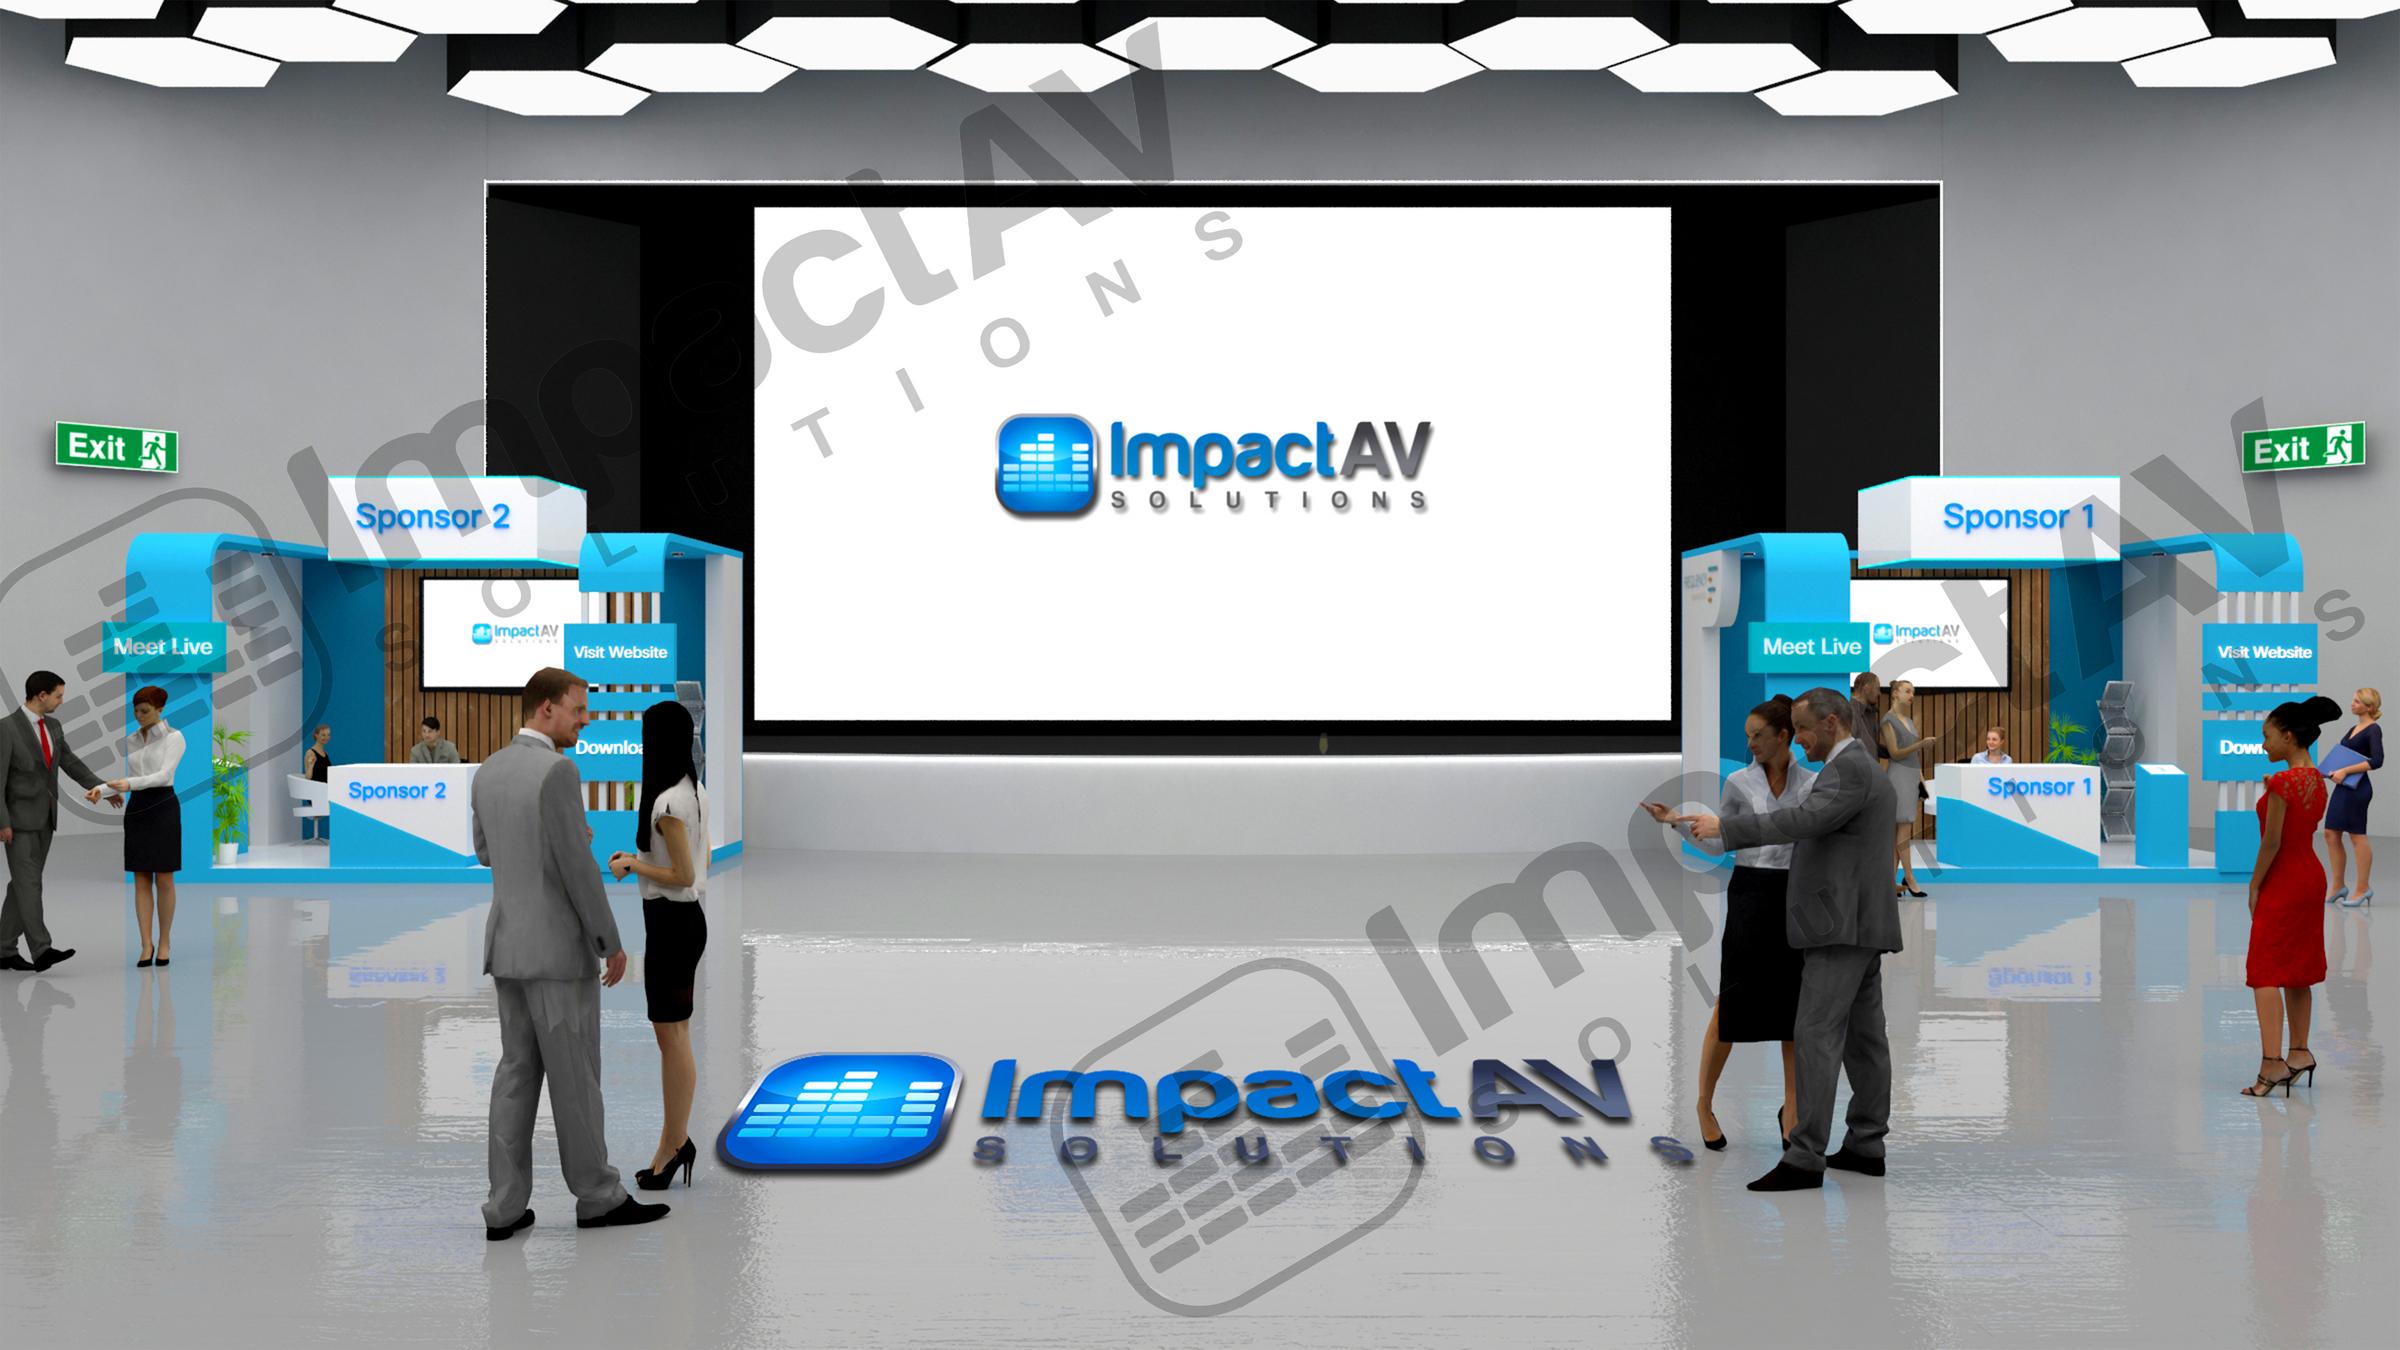 Impact AV Exhibition Hall